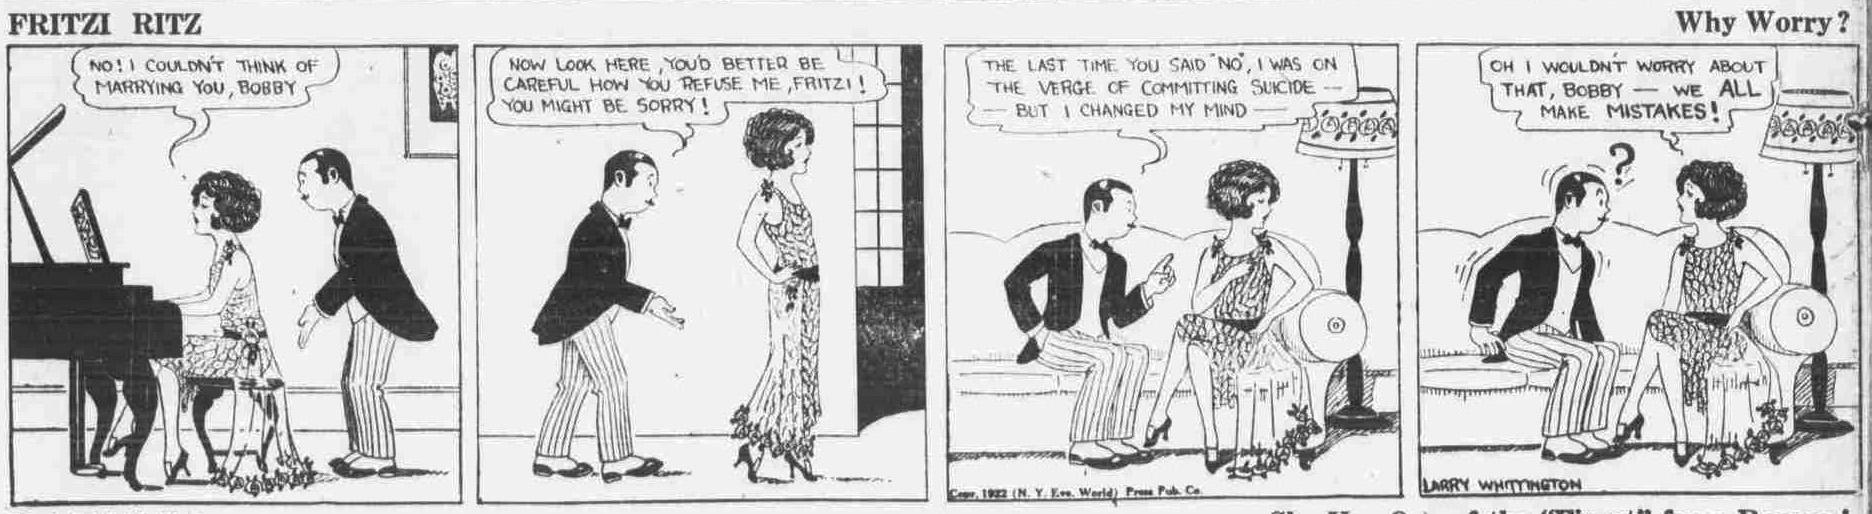 Dec. 20, 1922